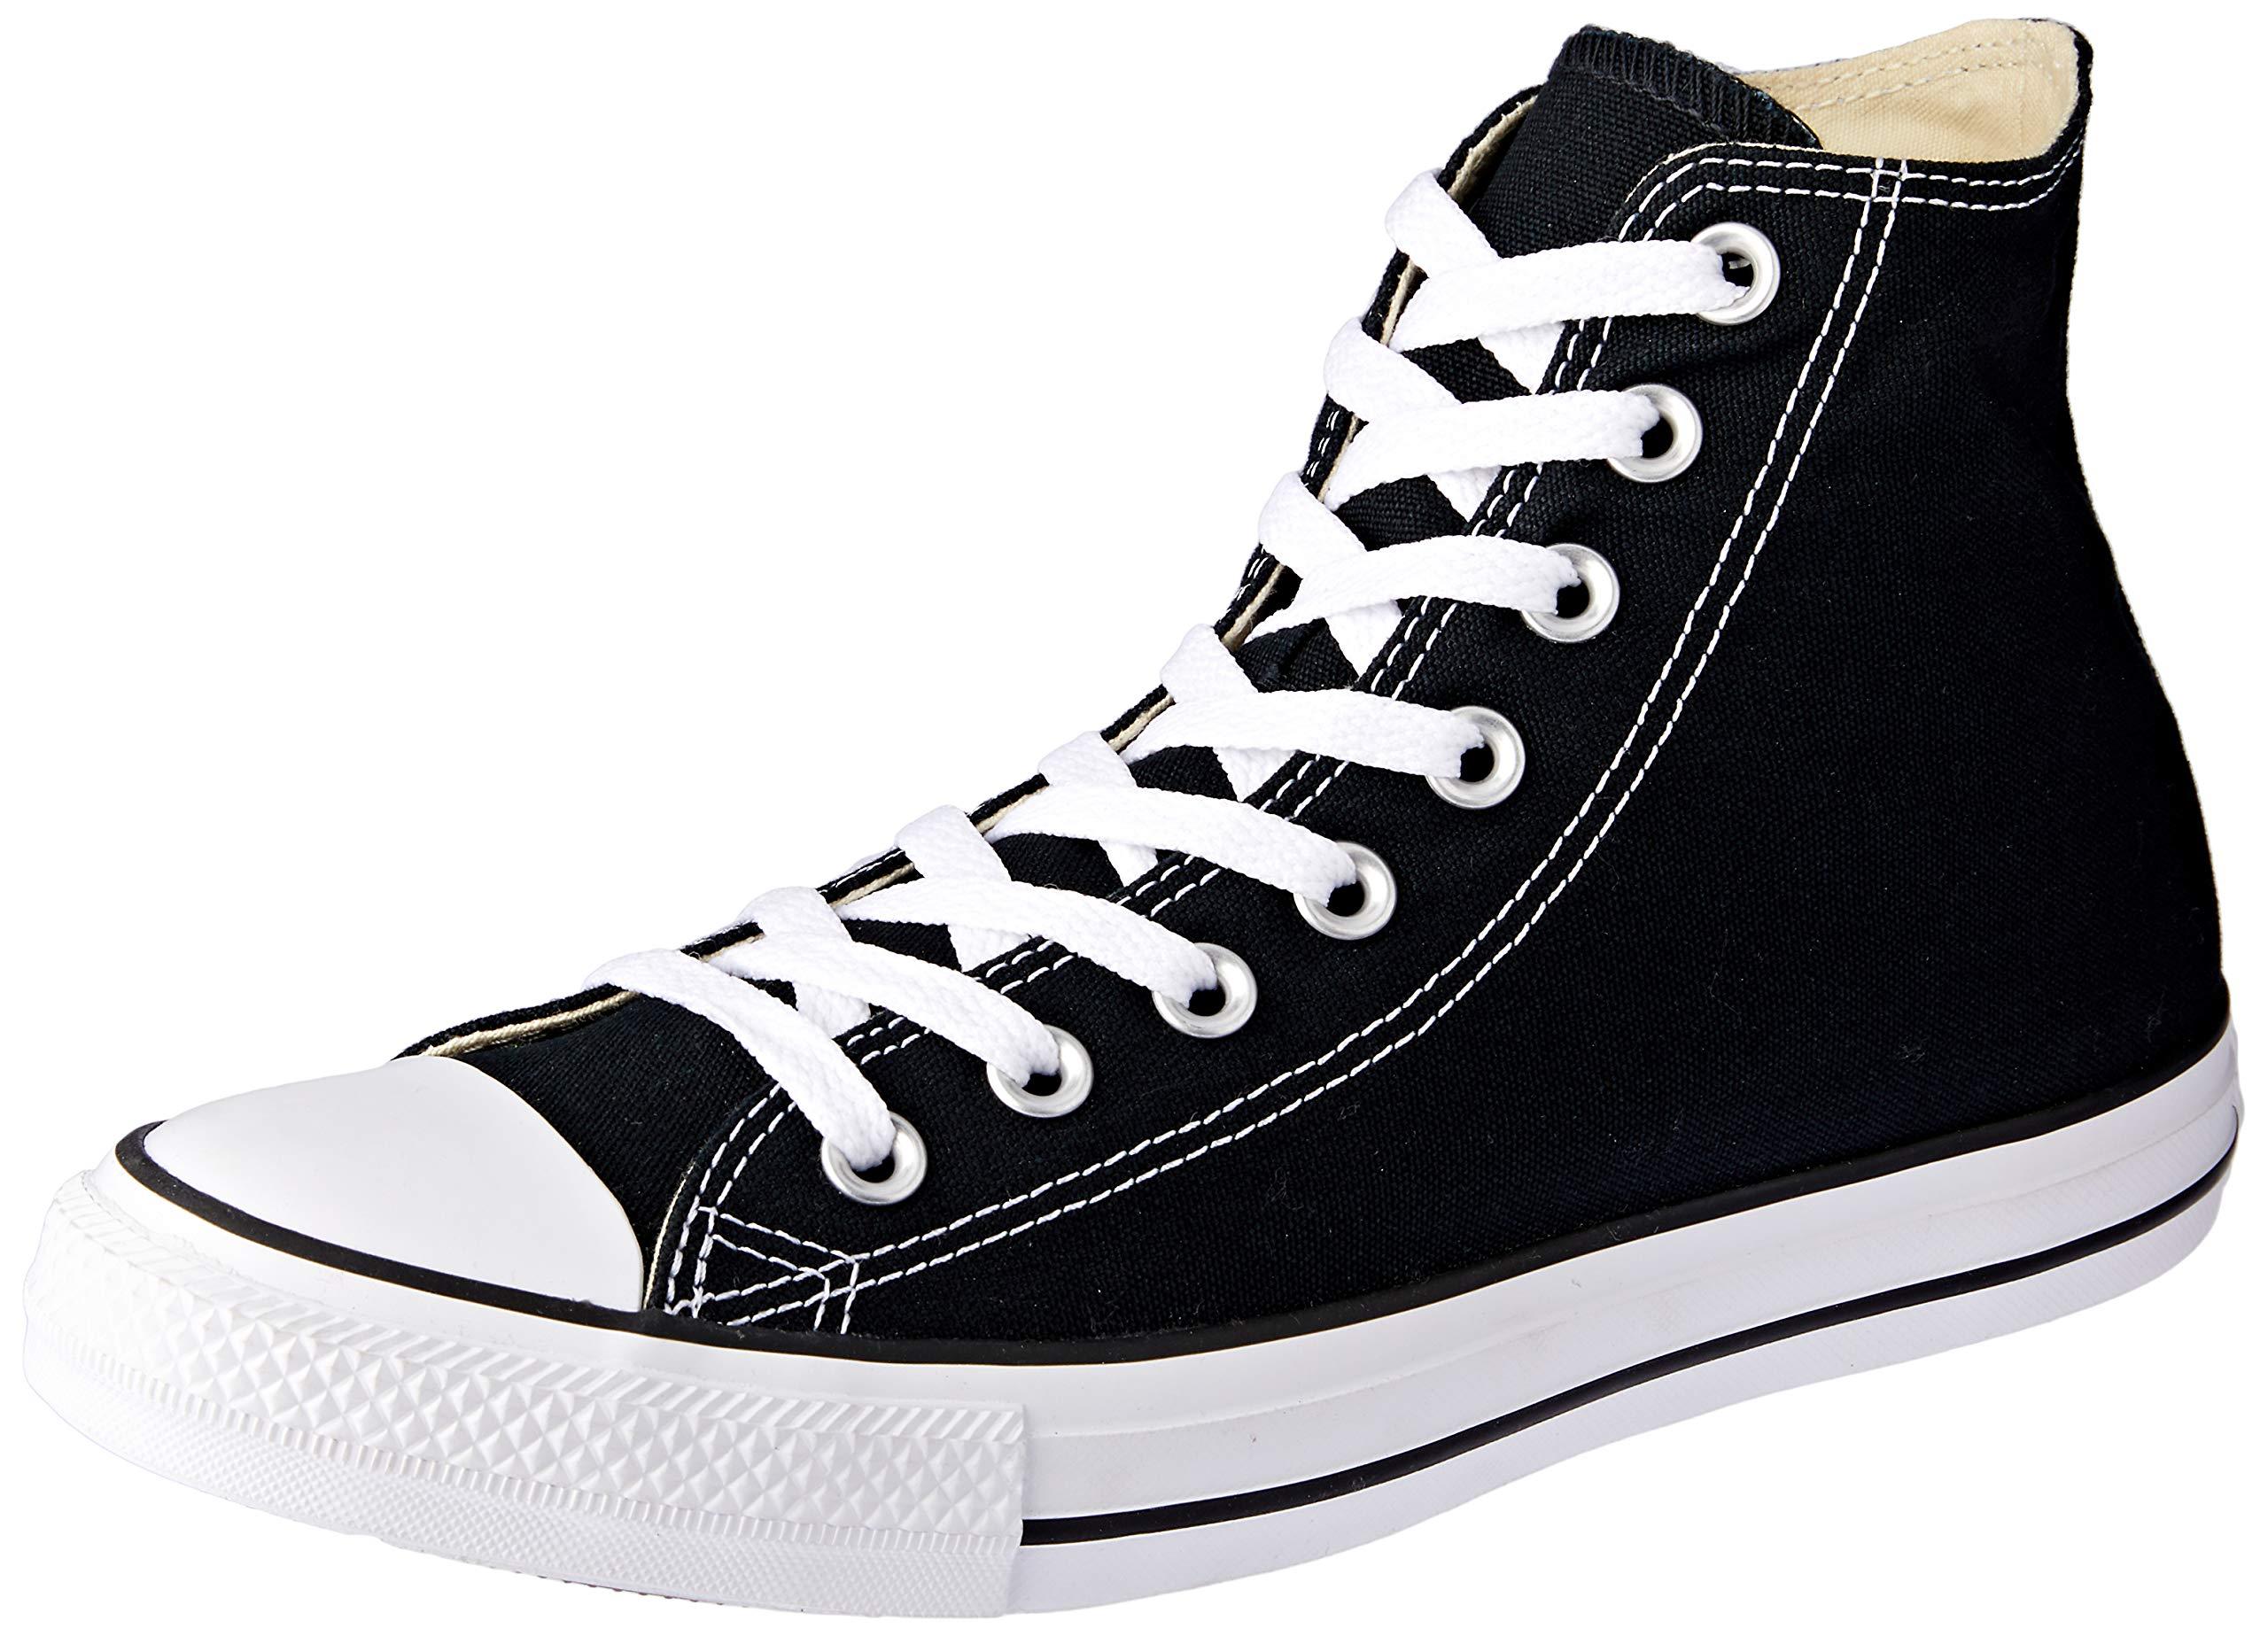 5a4d09d8e596 Converse Unisex Chuck Taylor All Star Hi Top Sneaker (7 B(M) US Women / 5  D(M) US Men, Black/White)